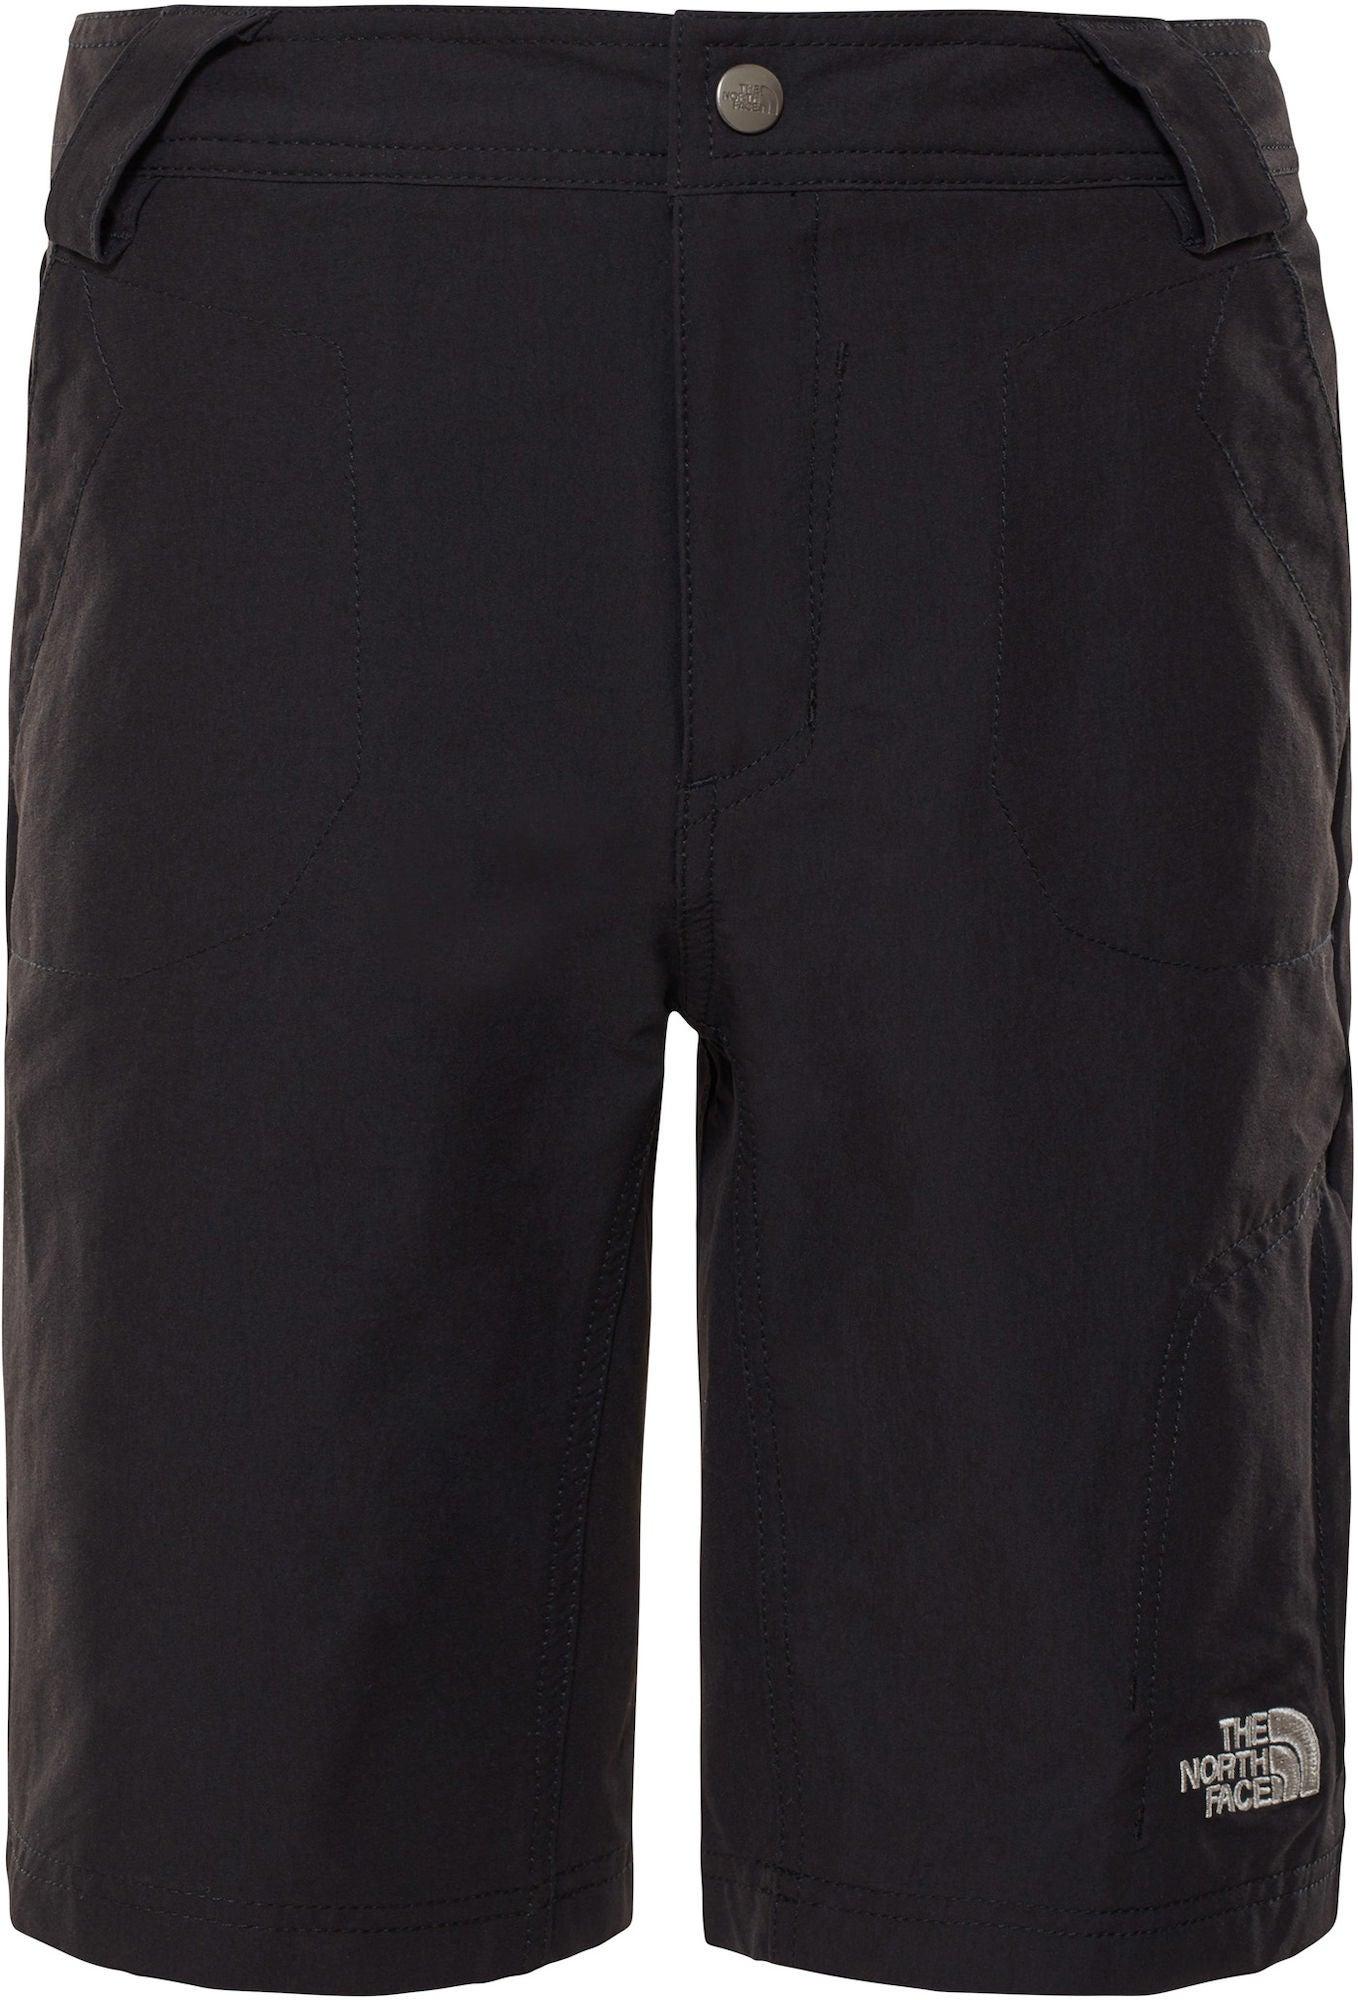 The North Face Exploration Shorts, Tnf Black XL